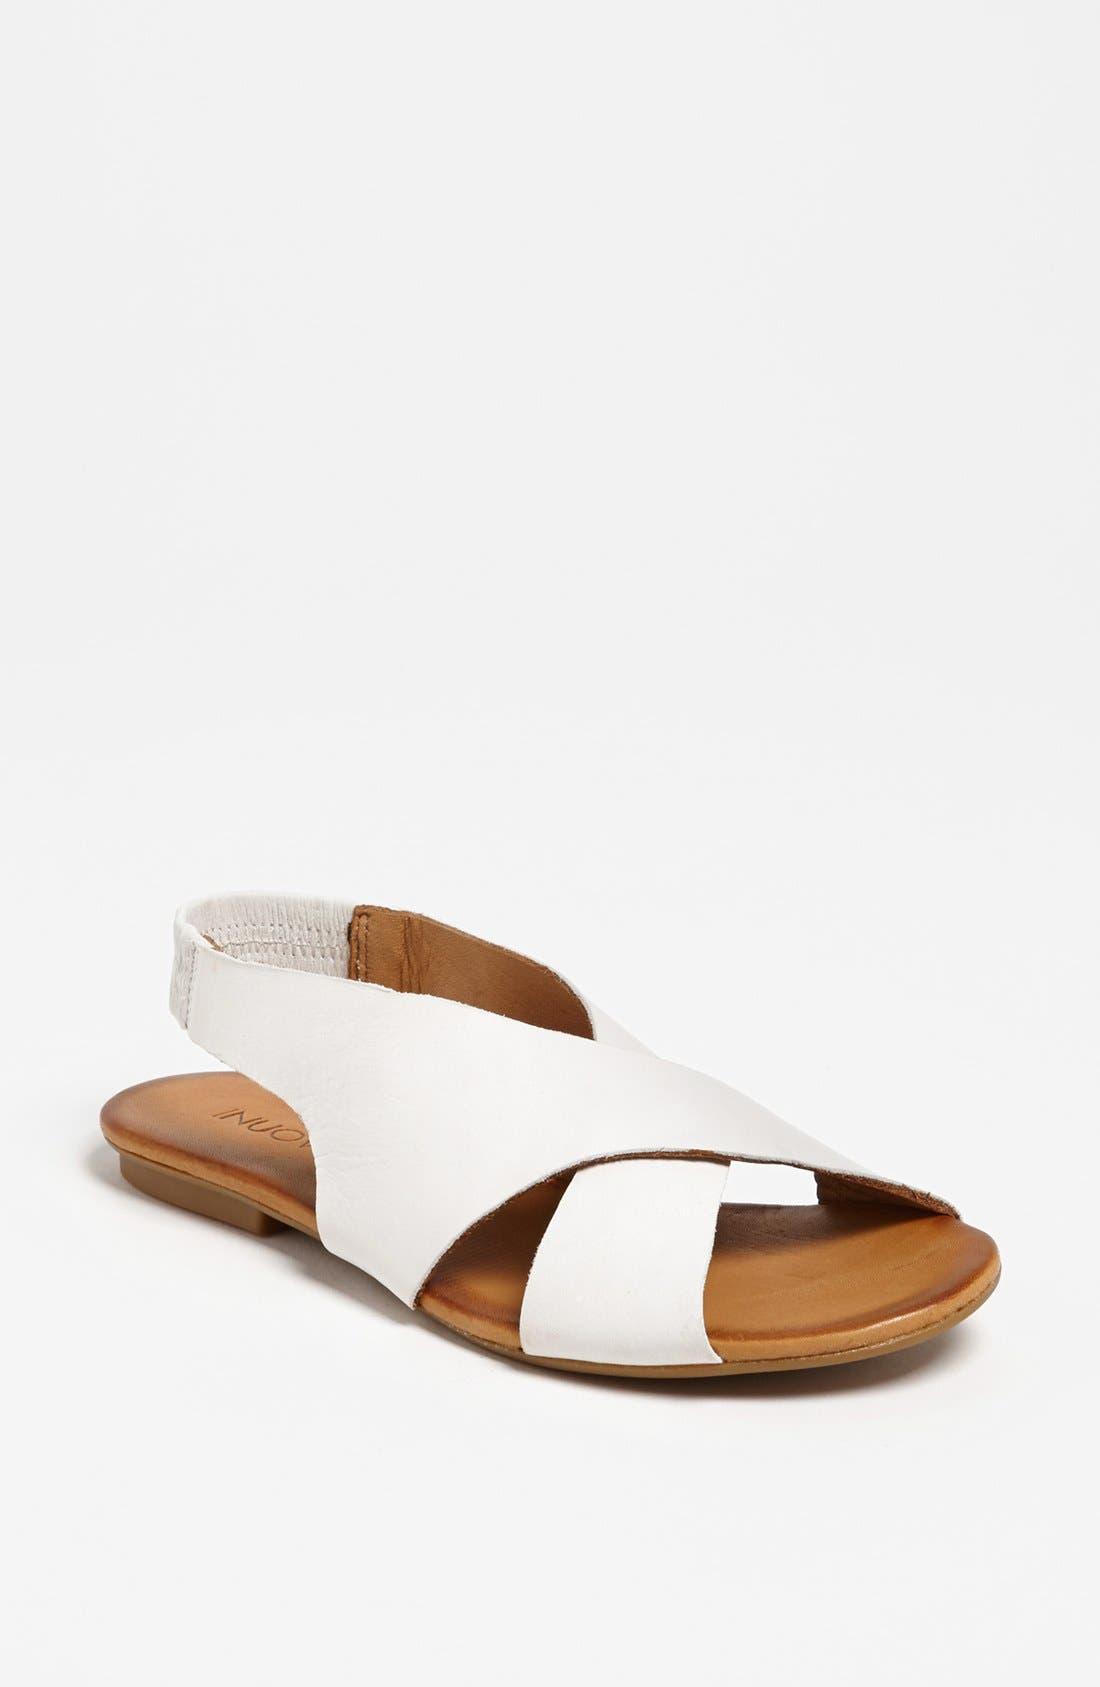 Alternate Image 1 Selected - Inuovo Slingback Sandal